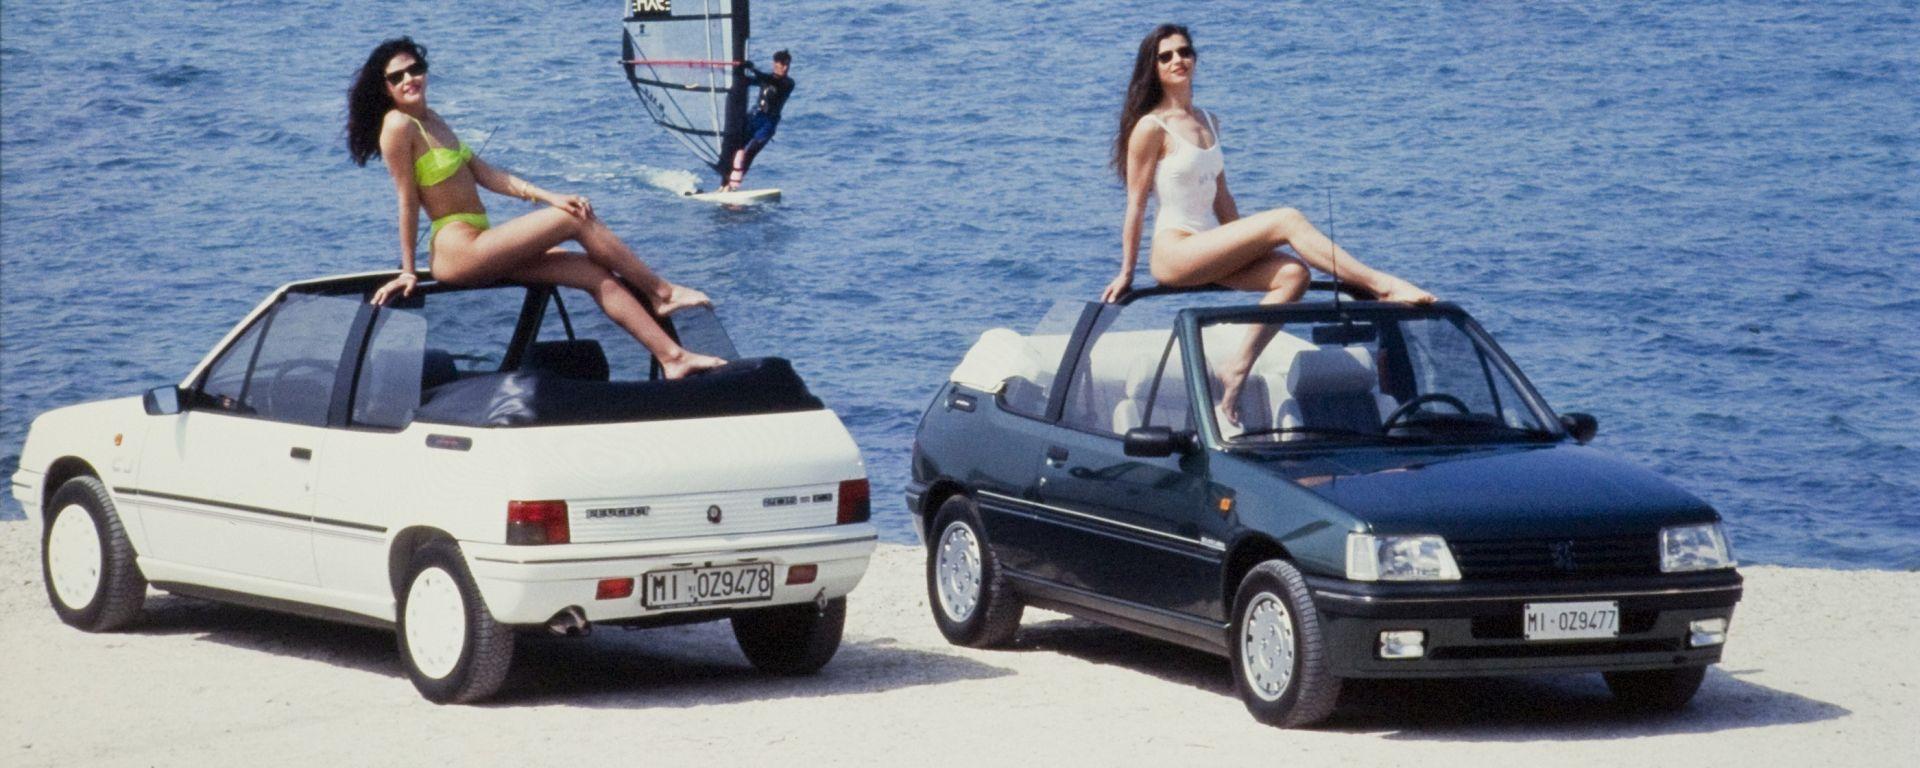 Peugeot 205 Cabriolet compie 30 anni